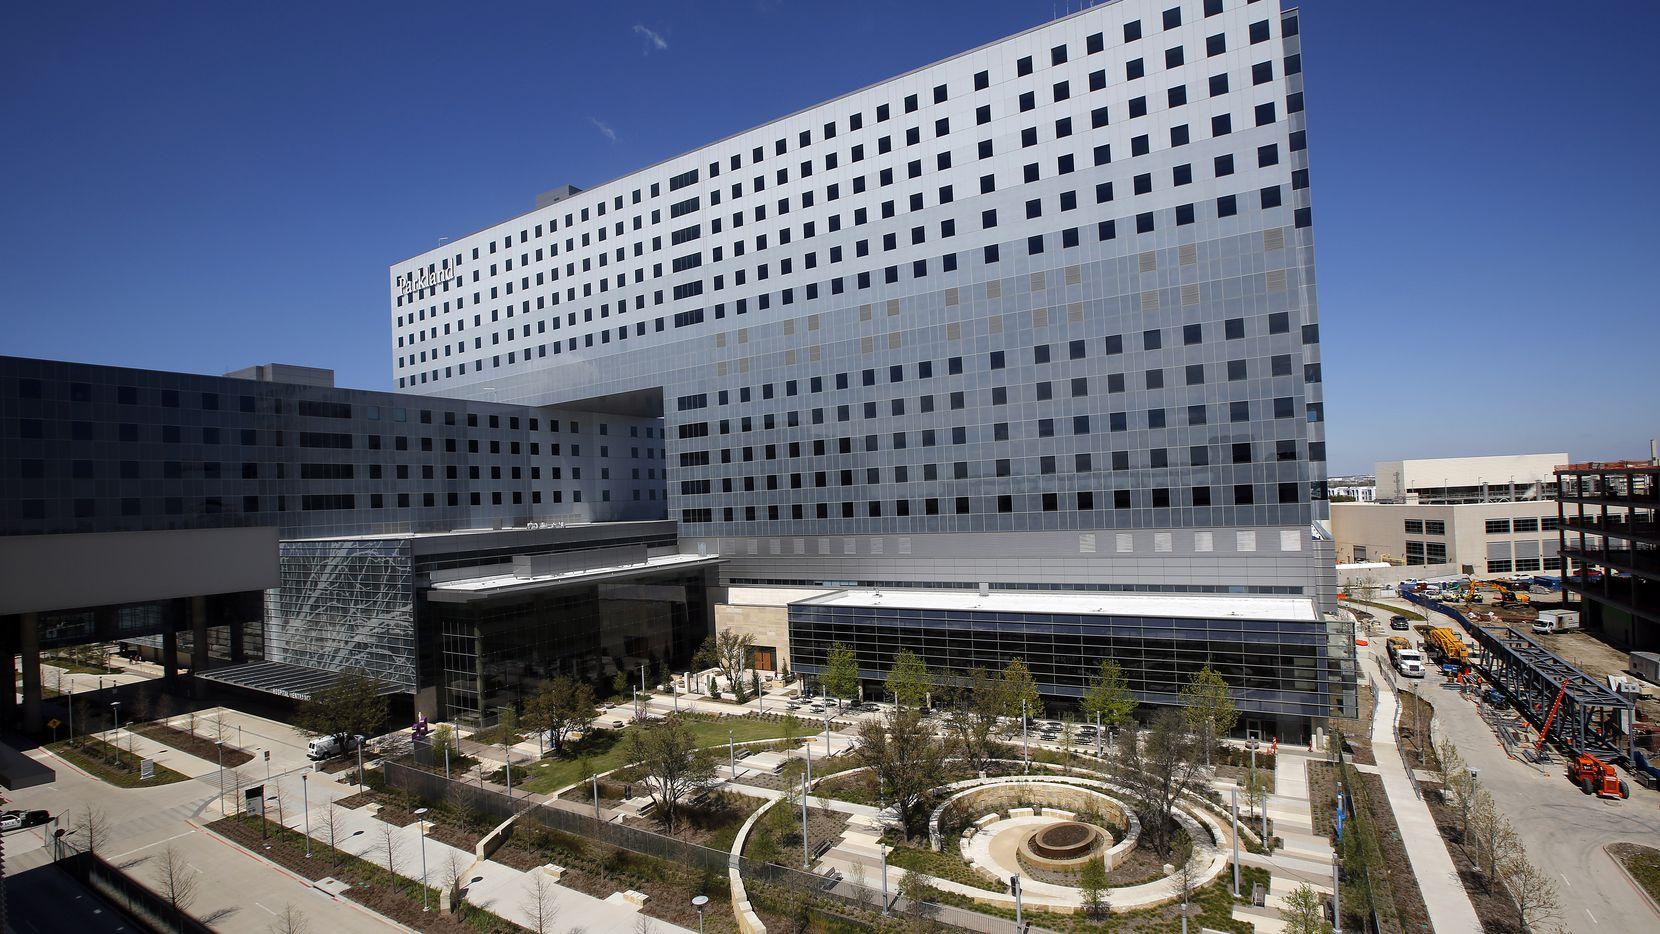 The new Parkland Memorial Hospital was a massive addition to the Dallas landscape.